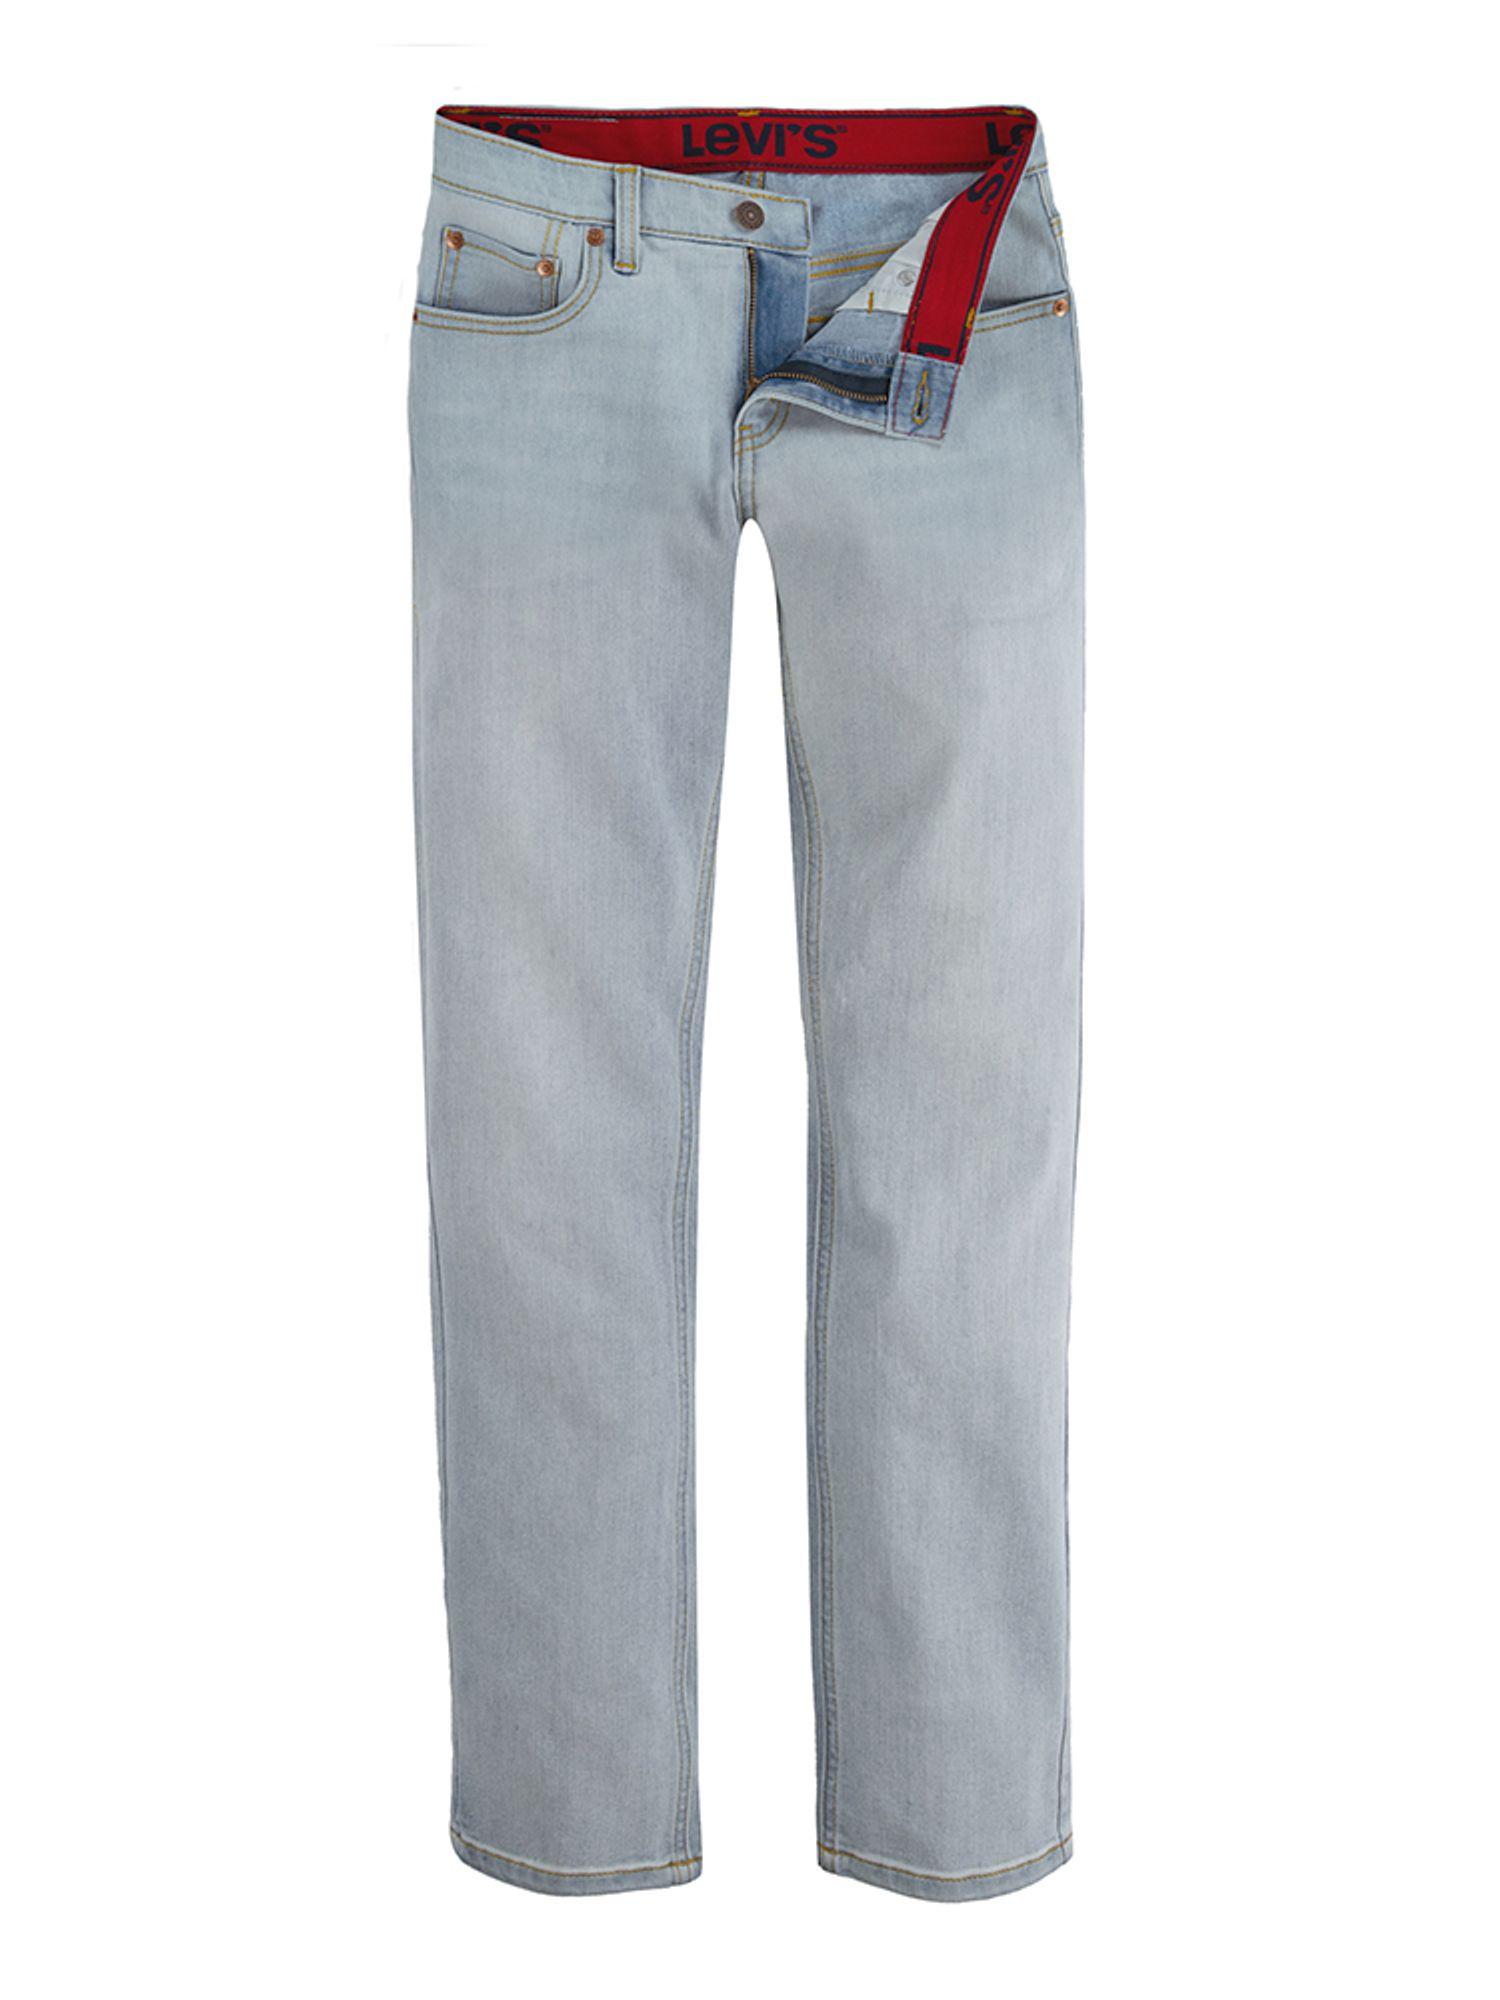 511™_Slim_Fit_Flex_Stretch_Jeans_Abbot_Kinney_-8-16_años-_1